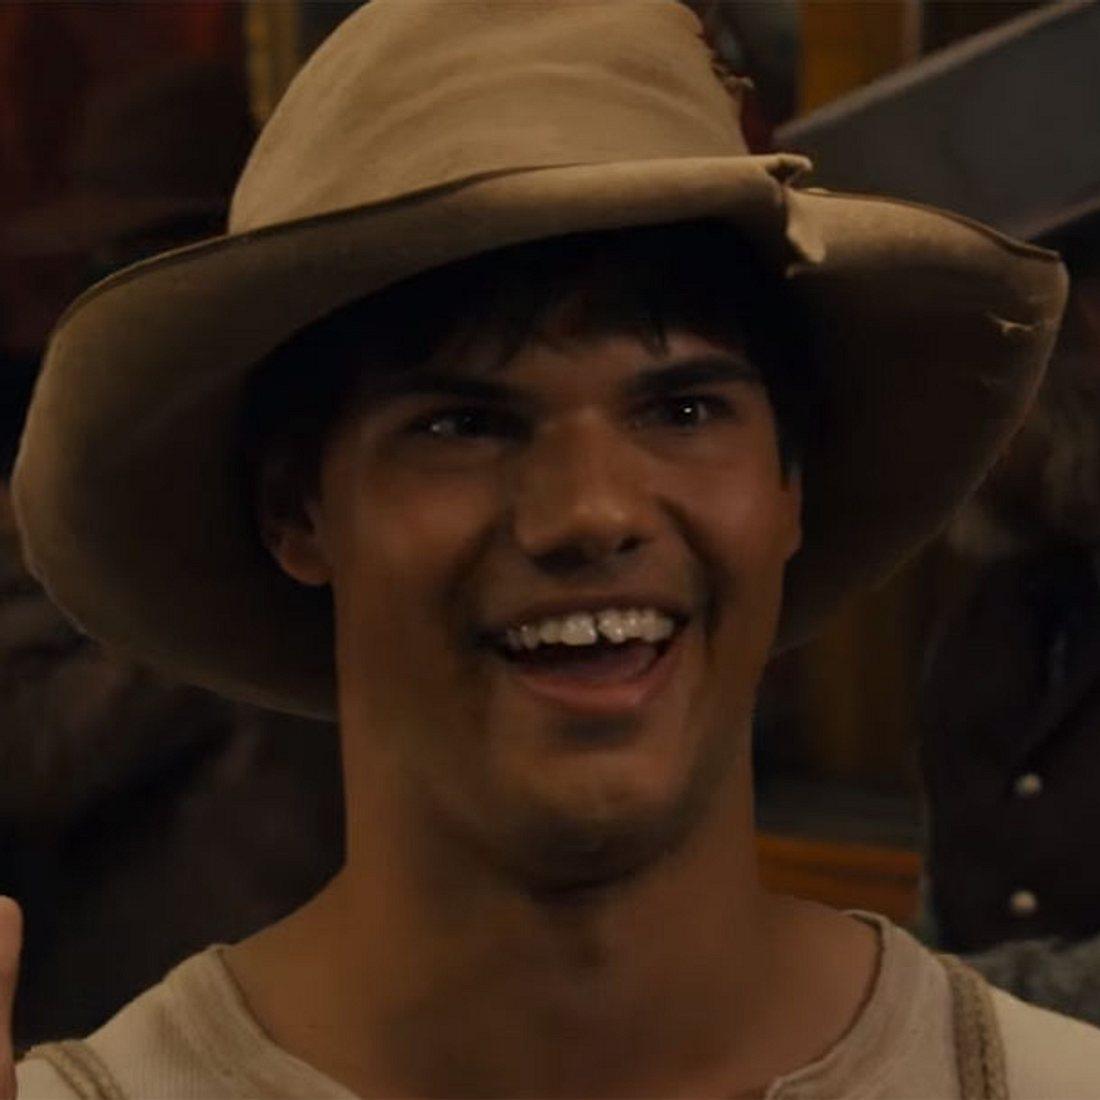 Taylor Lautner in Ridiculous 6